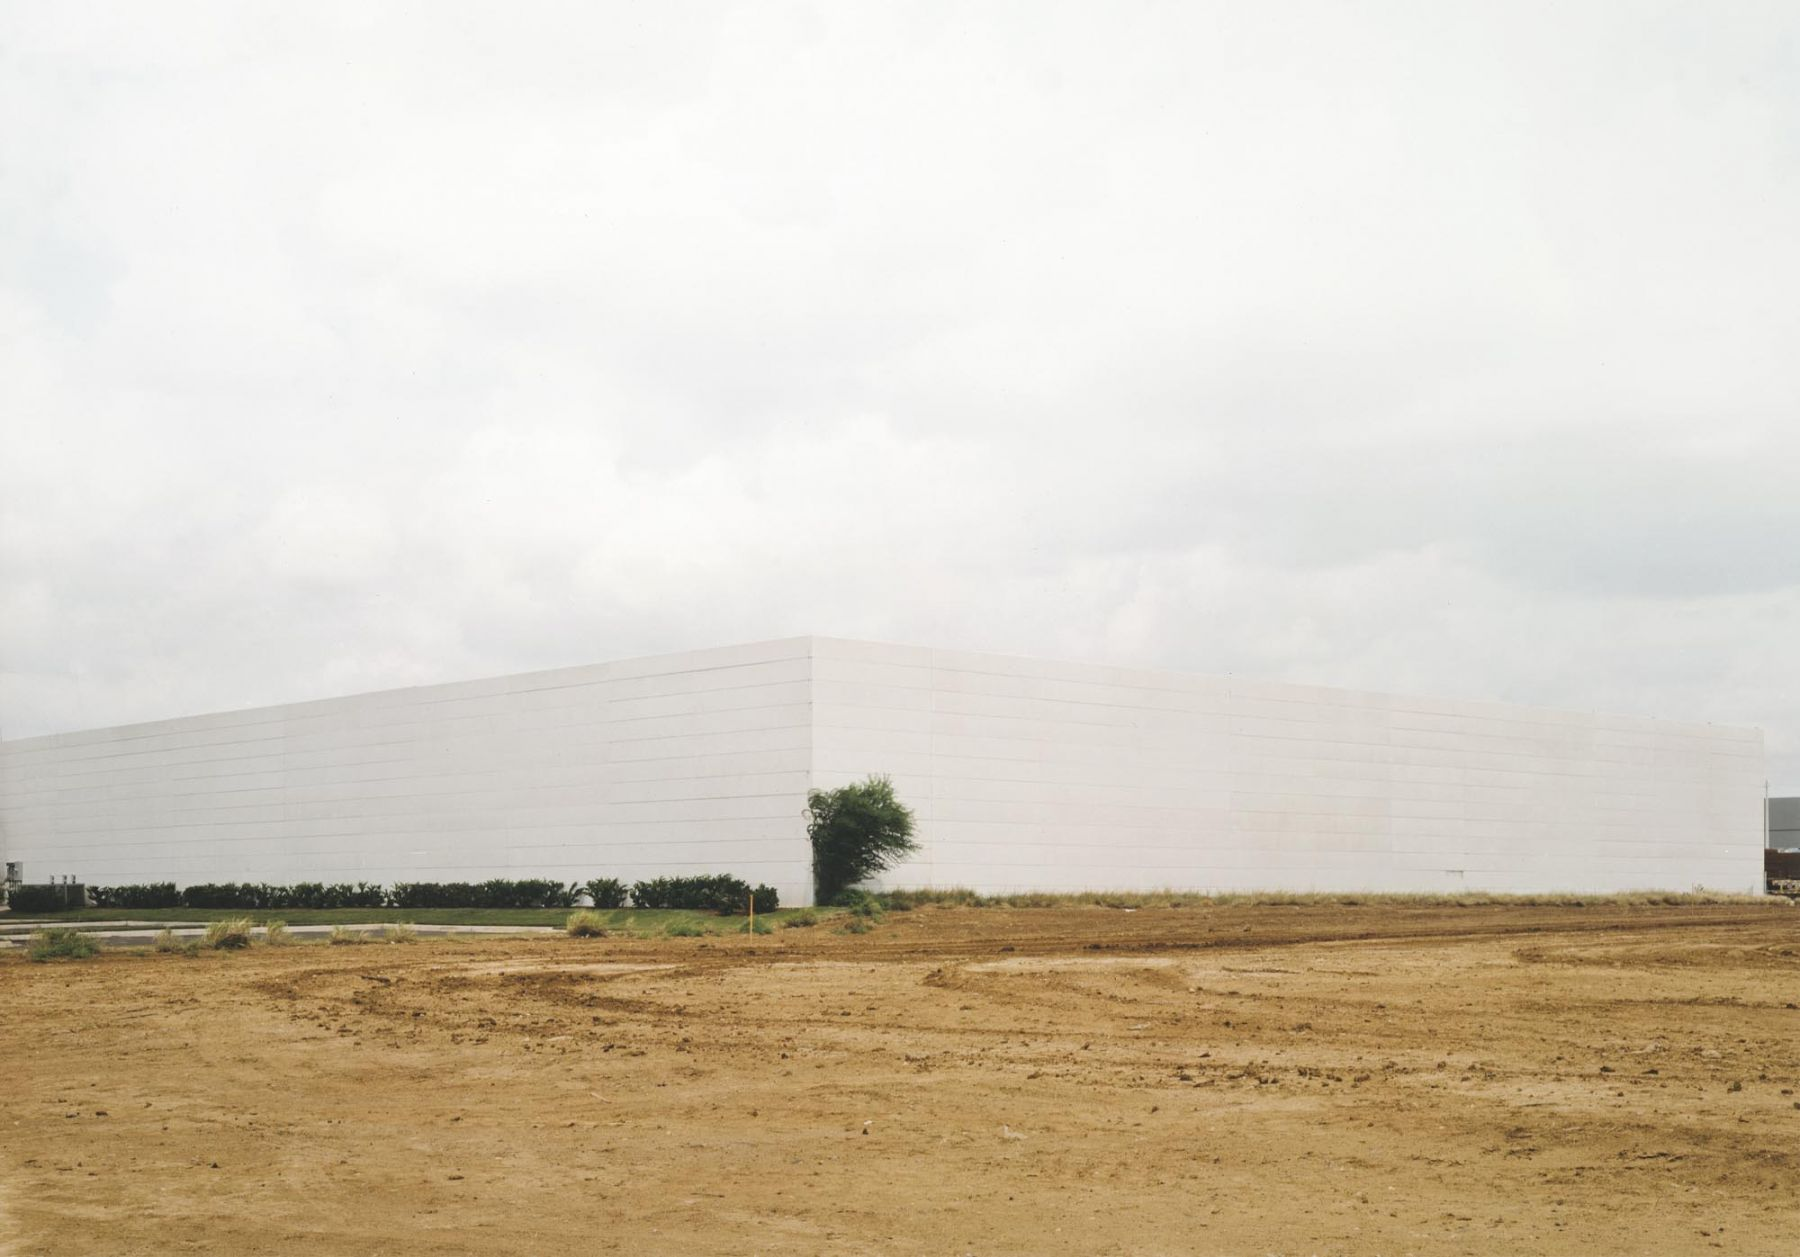 Untitled, White building with bush, Laredo, Texas, 2003, 39 x 55 inch or 55 x 75 inch chromogenic print